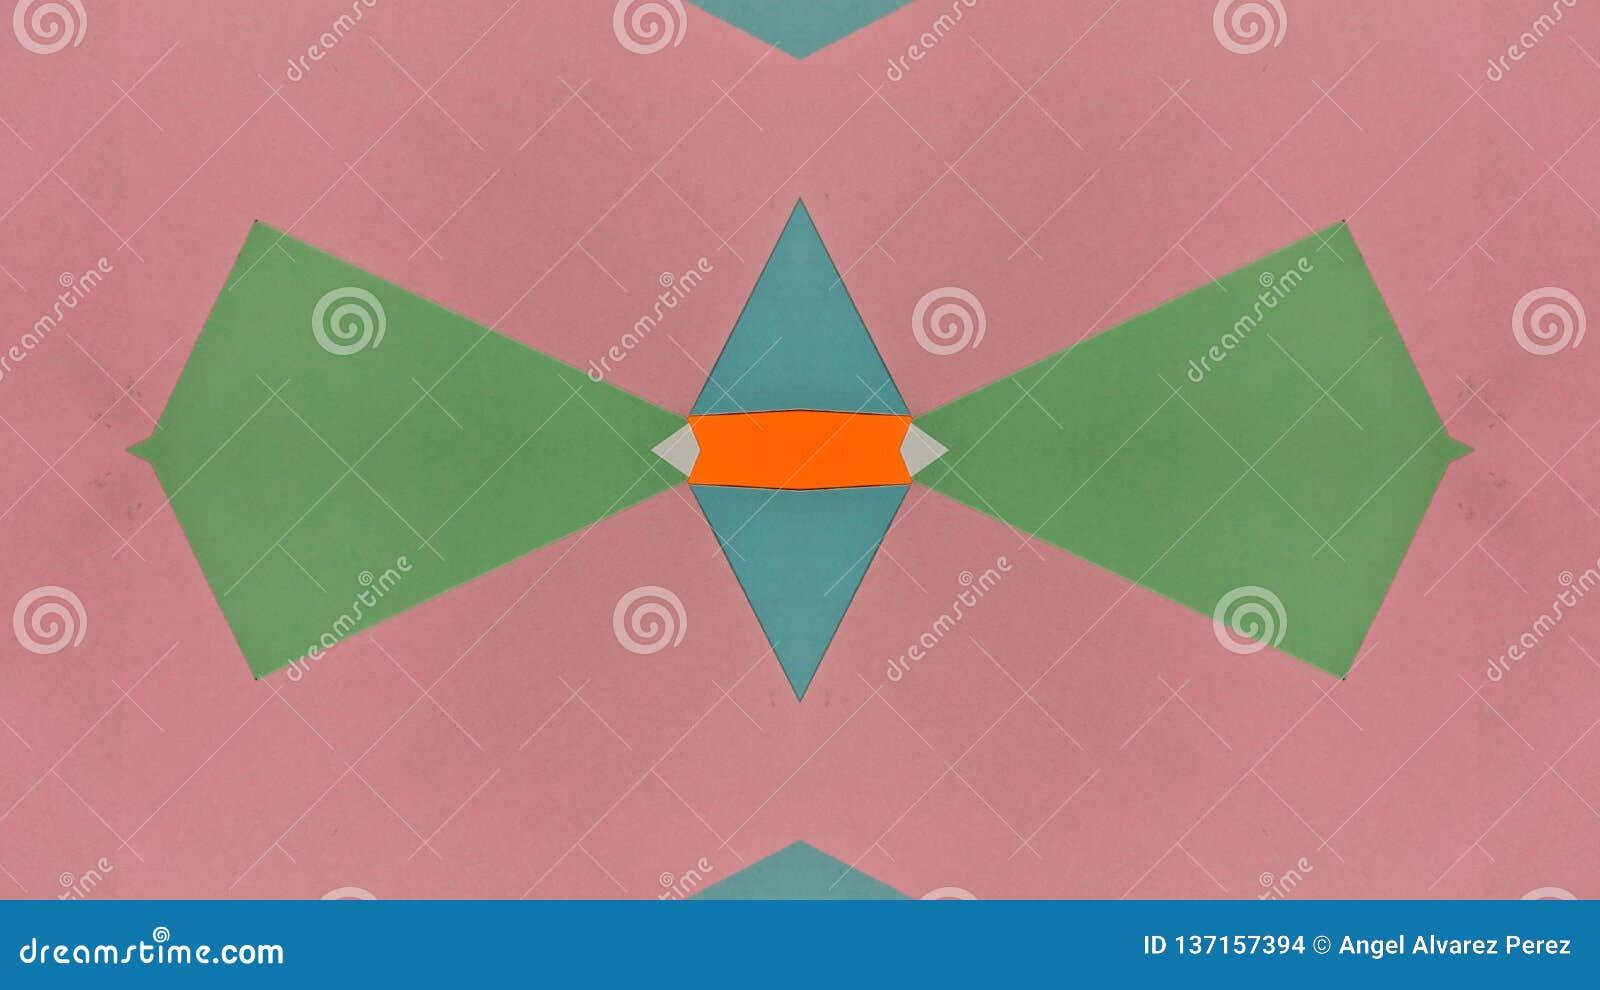 Ejemplo caleidoscópico de papeles coloreados